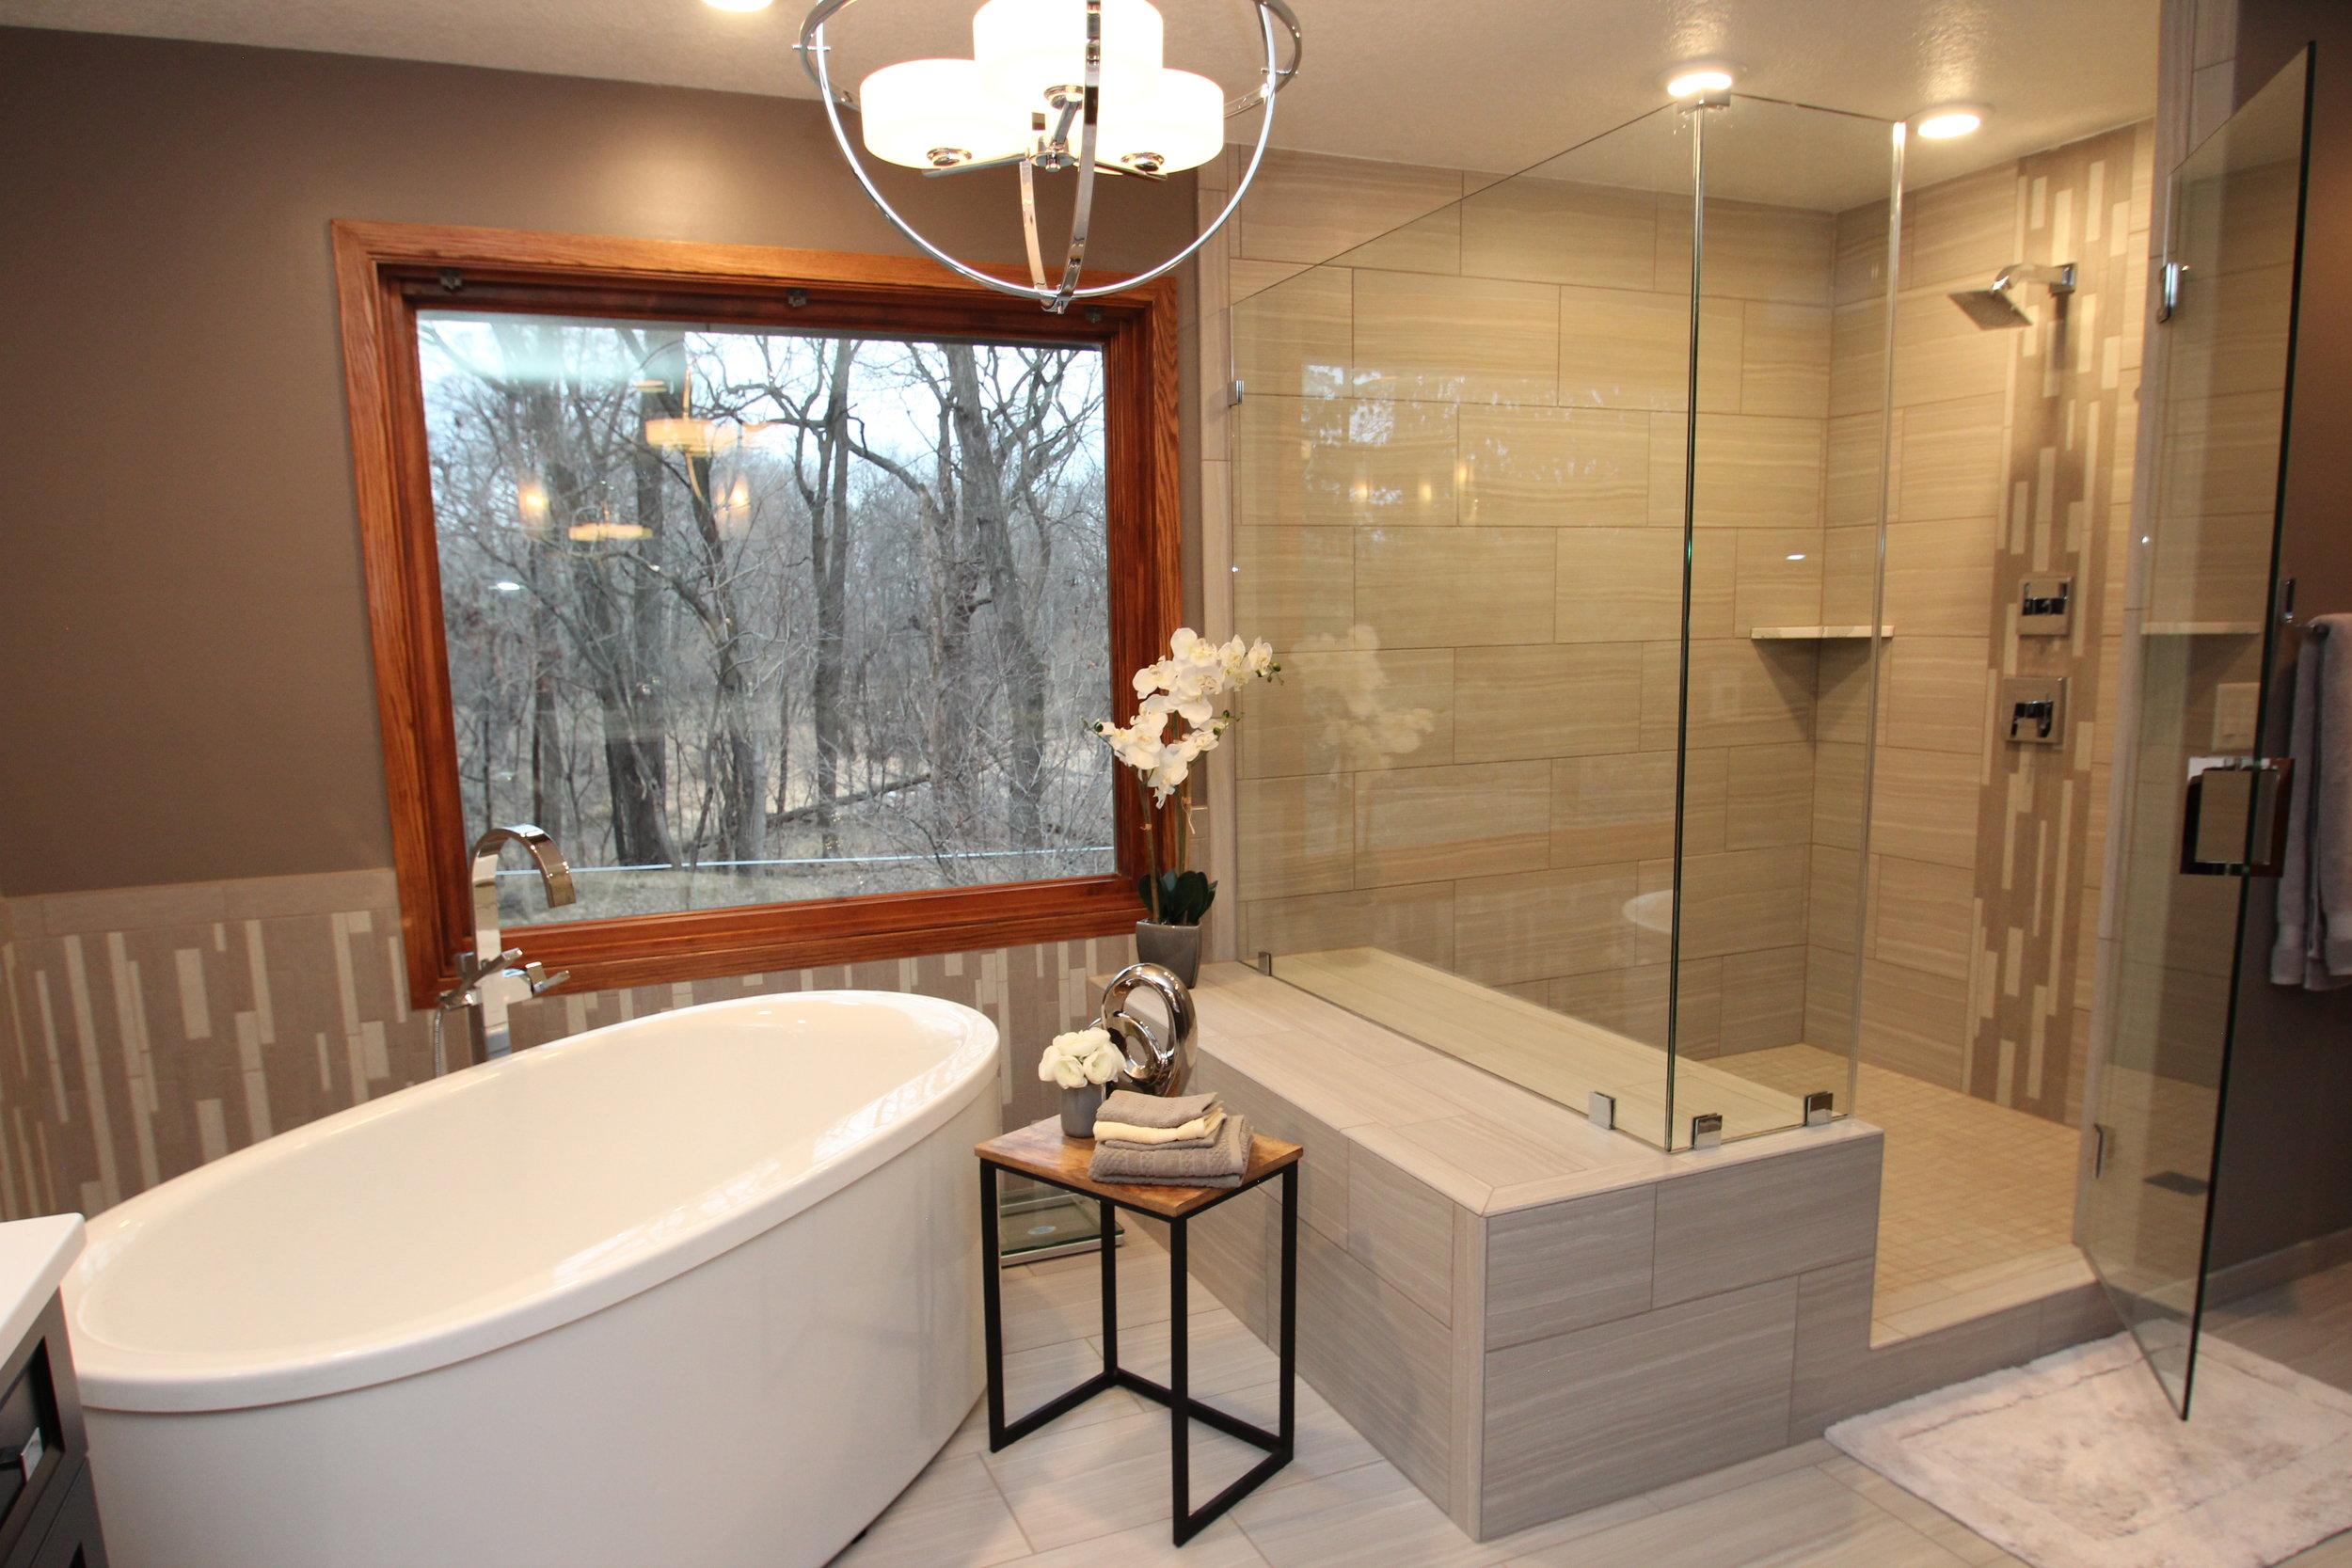 Shower:Tub View - Jabour's Final .JPG